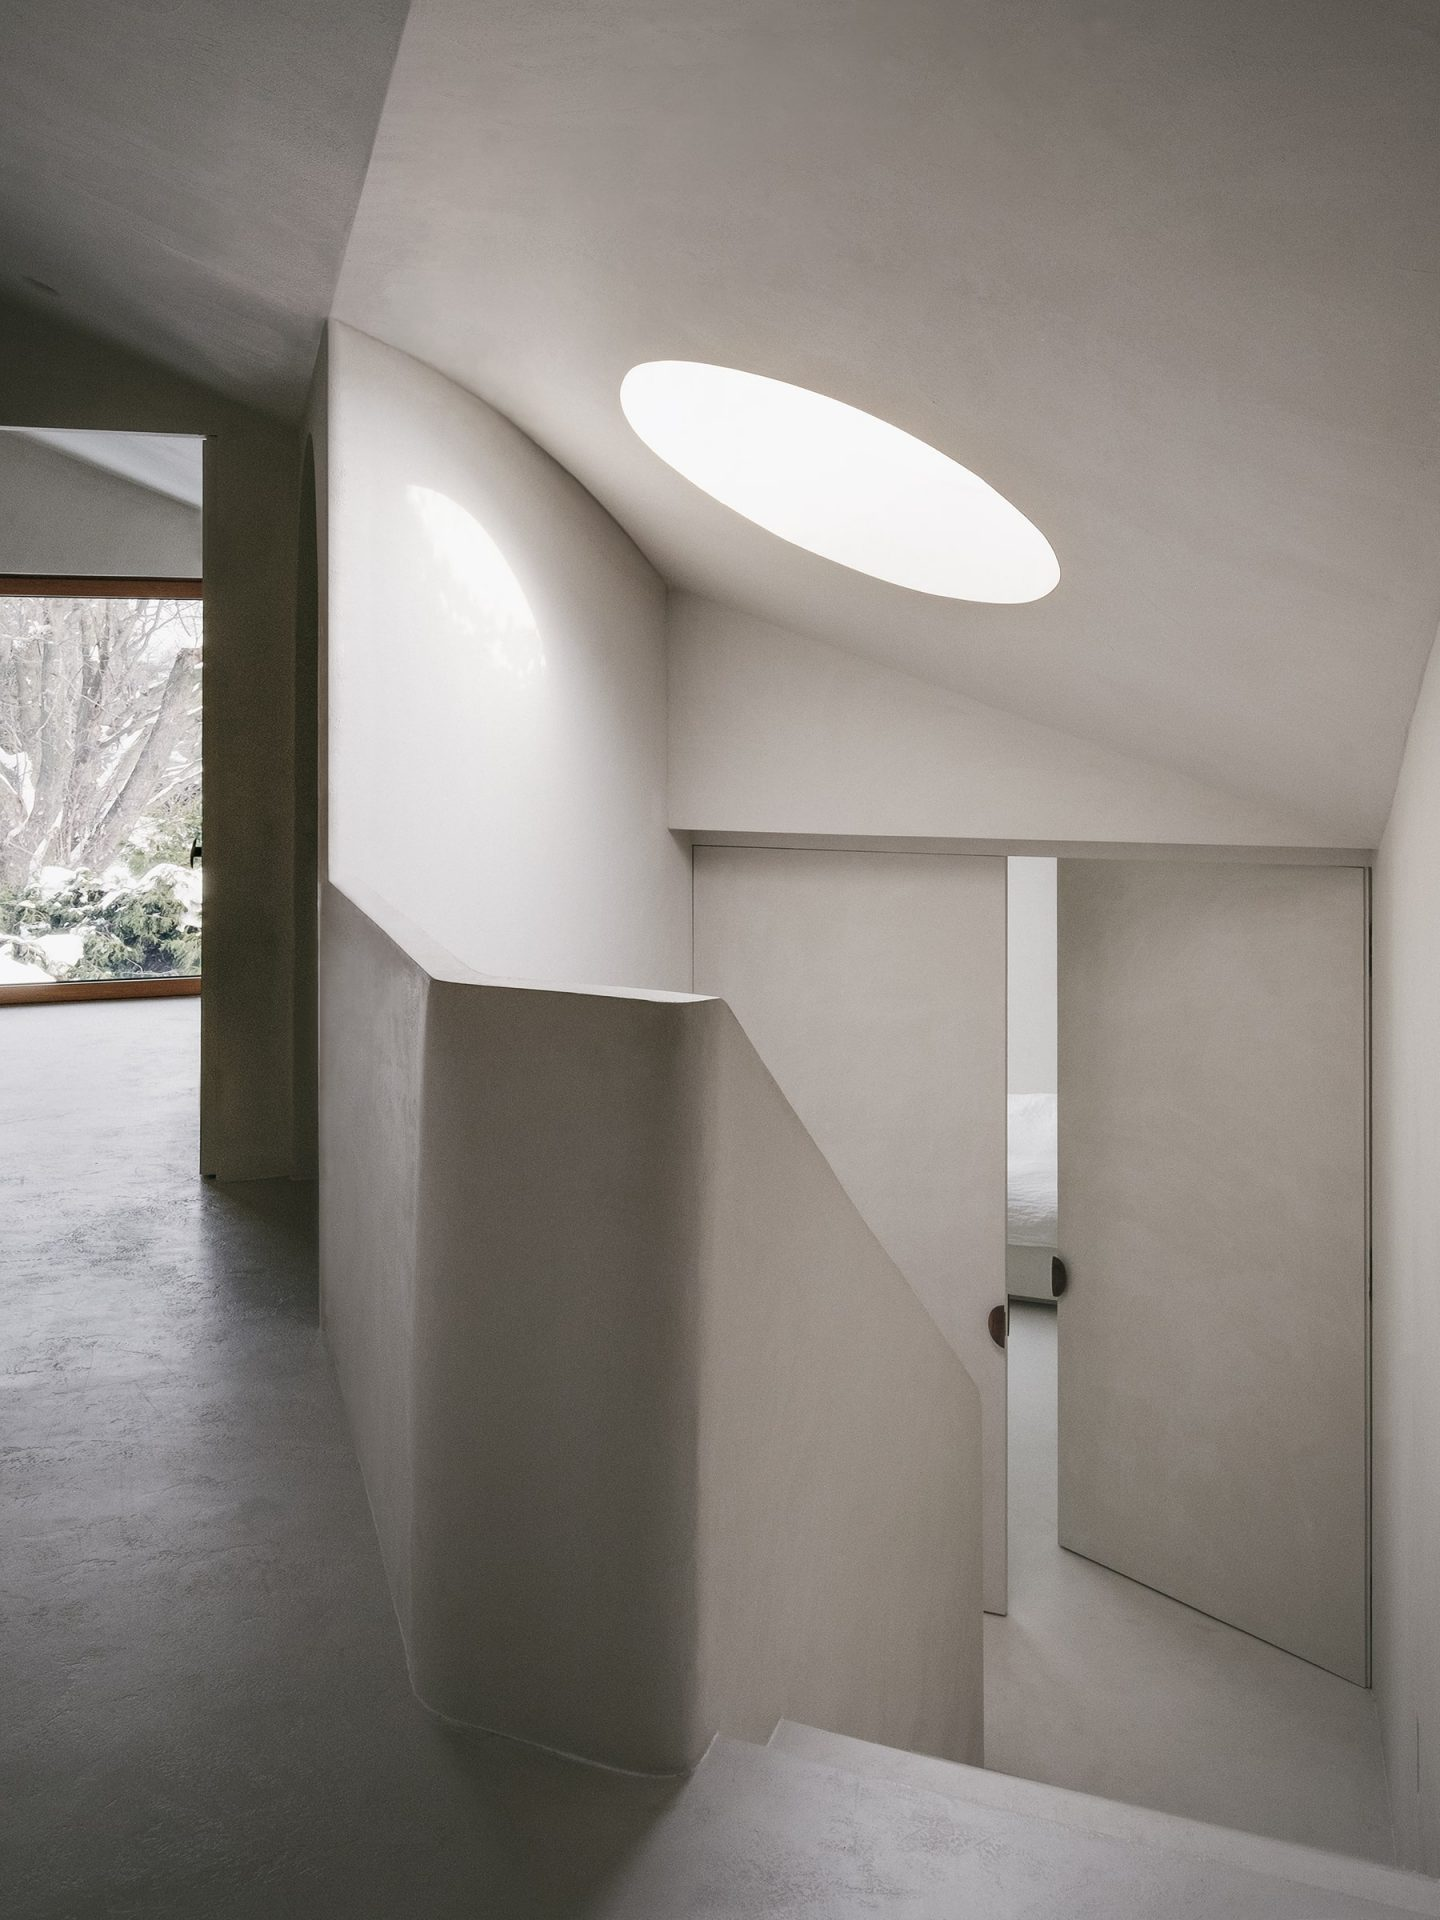 IGNANT-Architecture-Residential-NORM-AlainCarleArchitecte-©-F.-Michaud-12